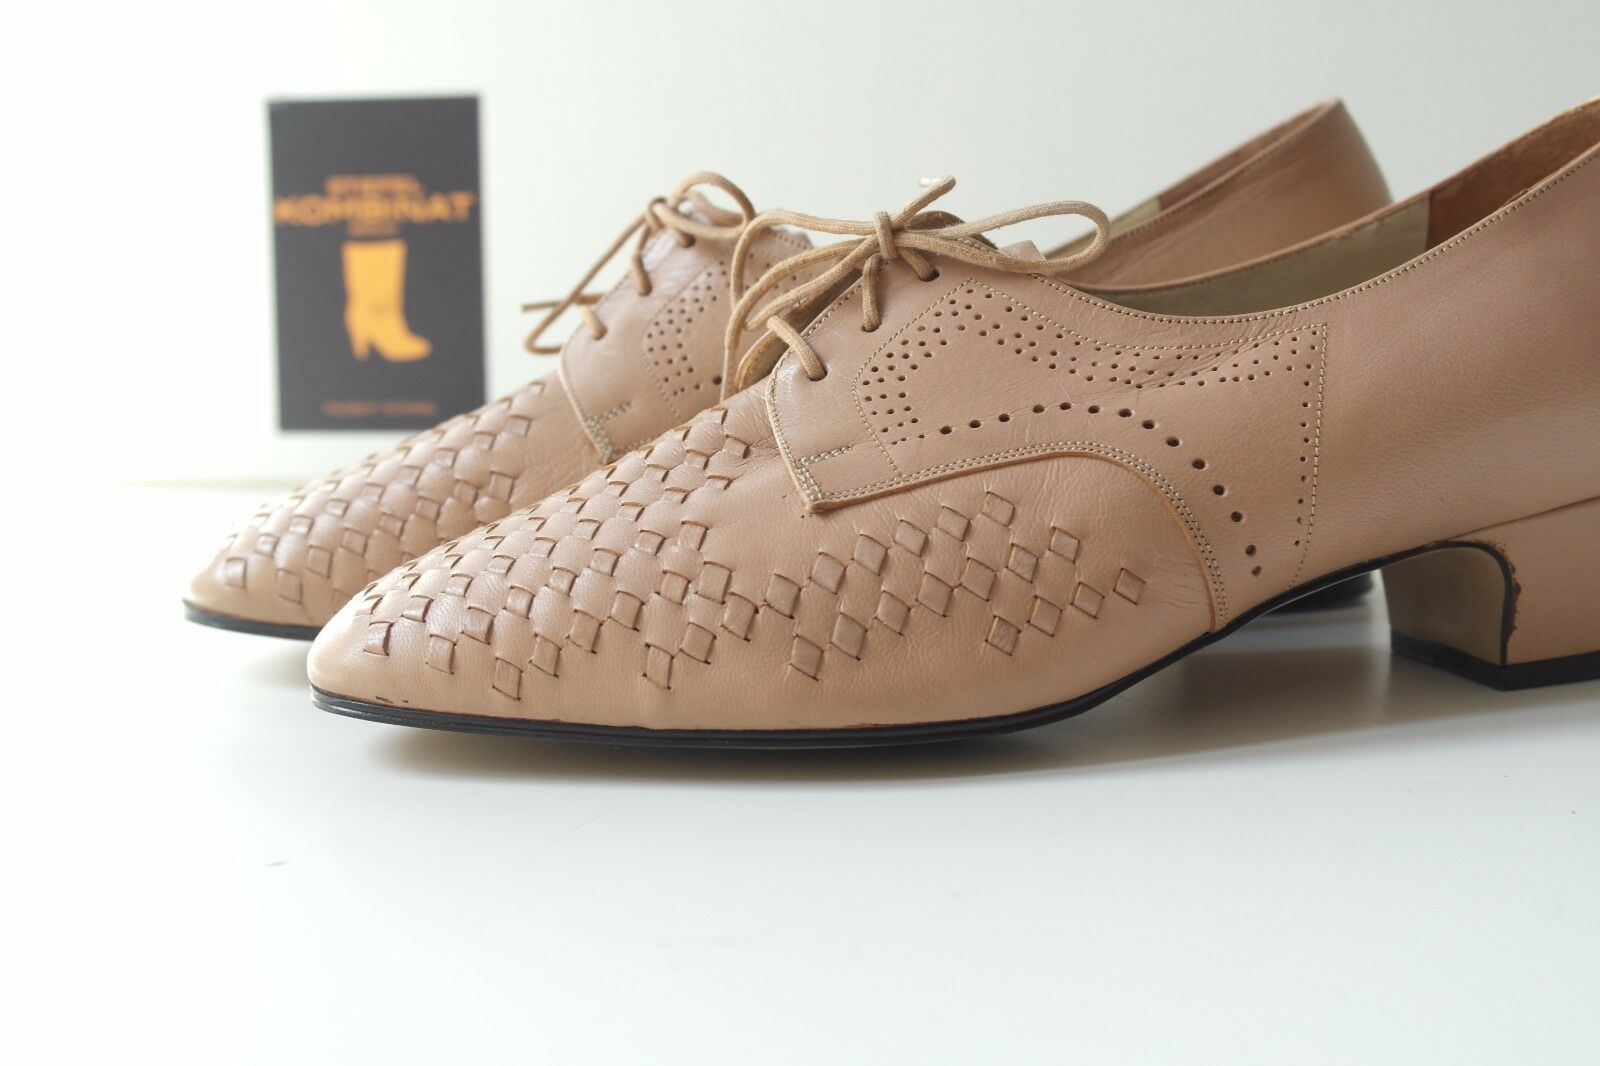 TRUE VINTAGE Damen Schuhe DIANA MED Pumps Halbschuhe 60s Halbschuhe Pumps NOS Budapester EUR 38,5 0873b5